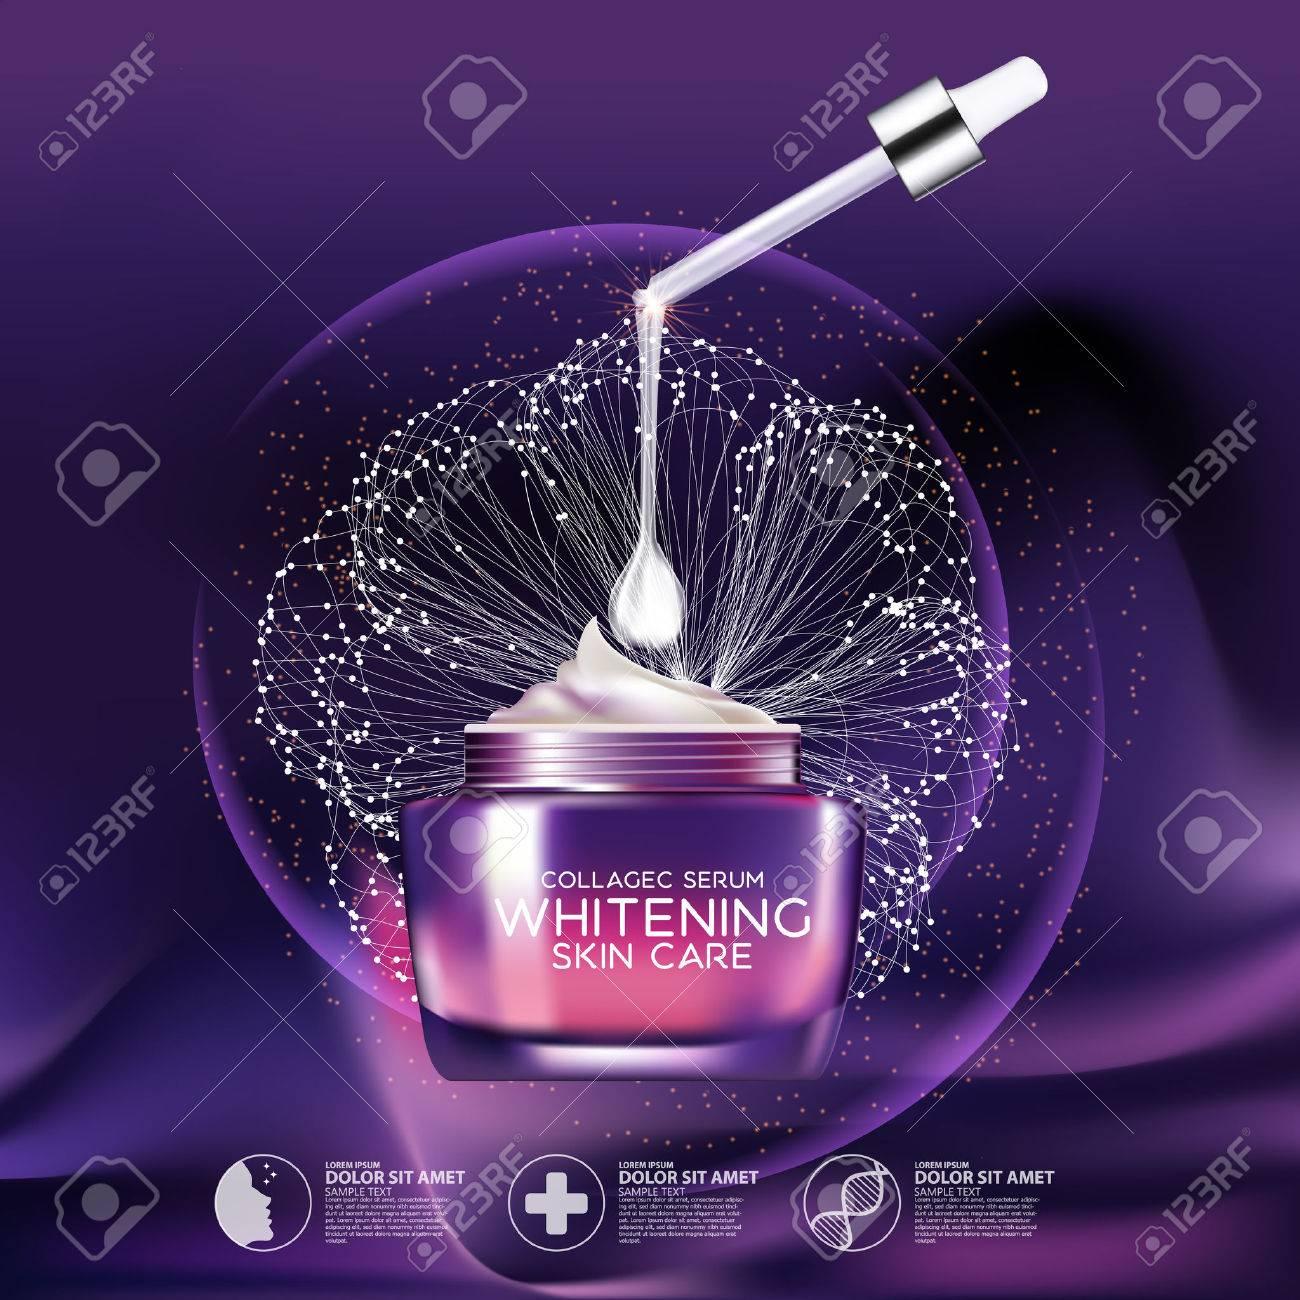 Collagen Serum Background Concept Skin Care Cosmetic - 59890754